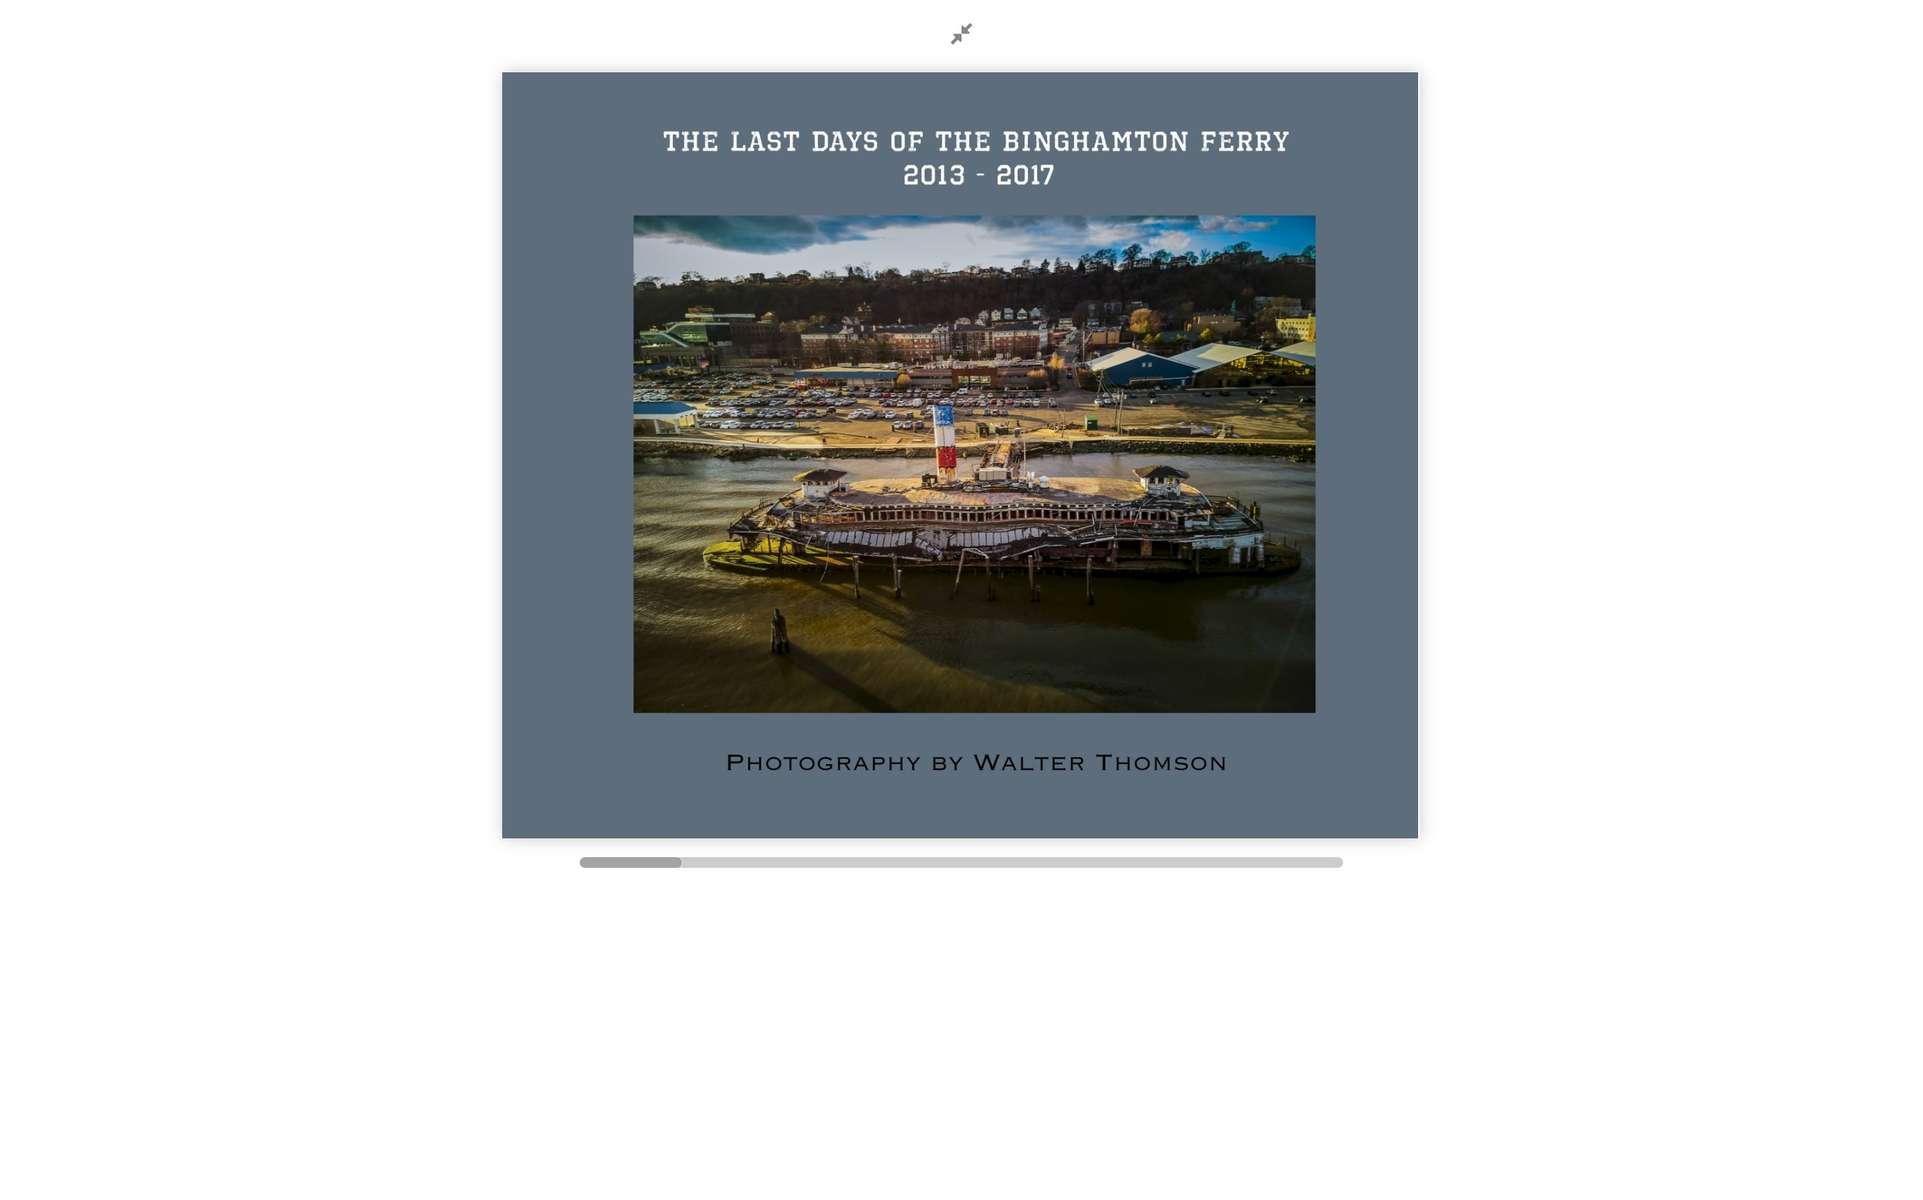 The_Last_Days_of_The_Binghamton_Ferry_2013-2017